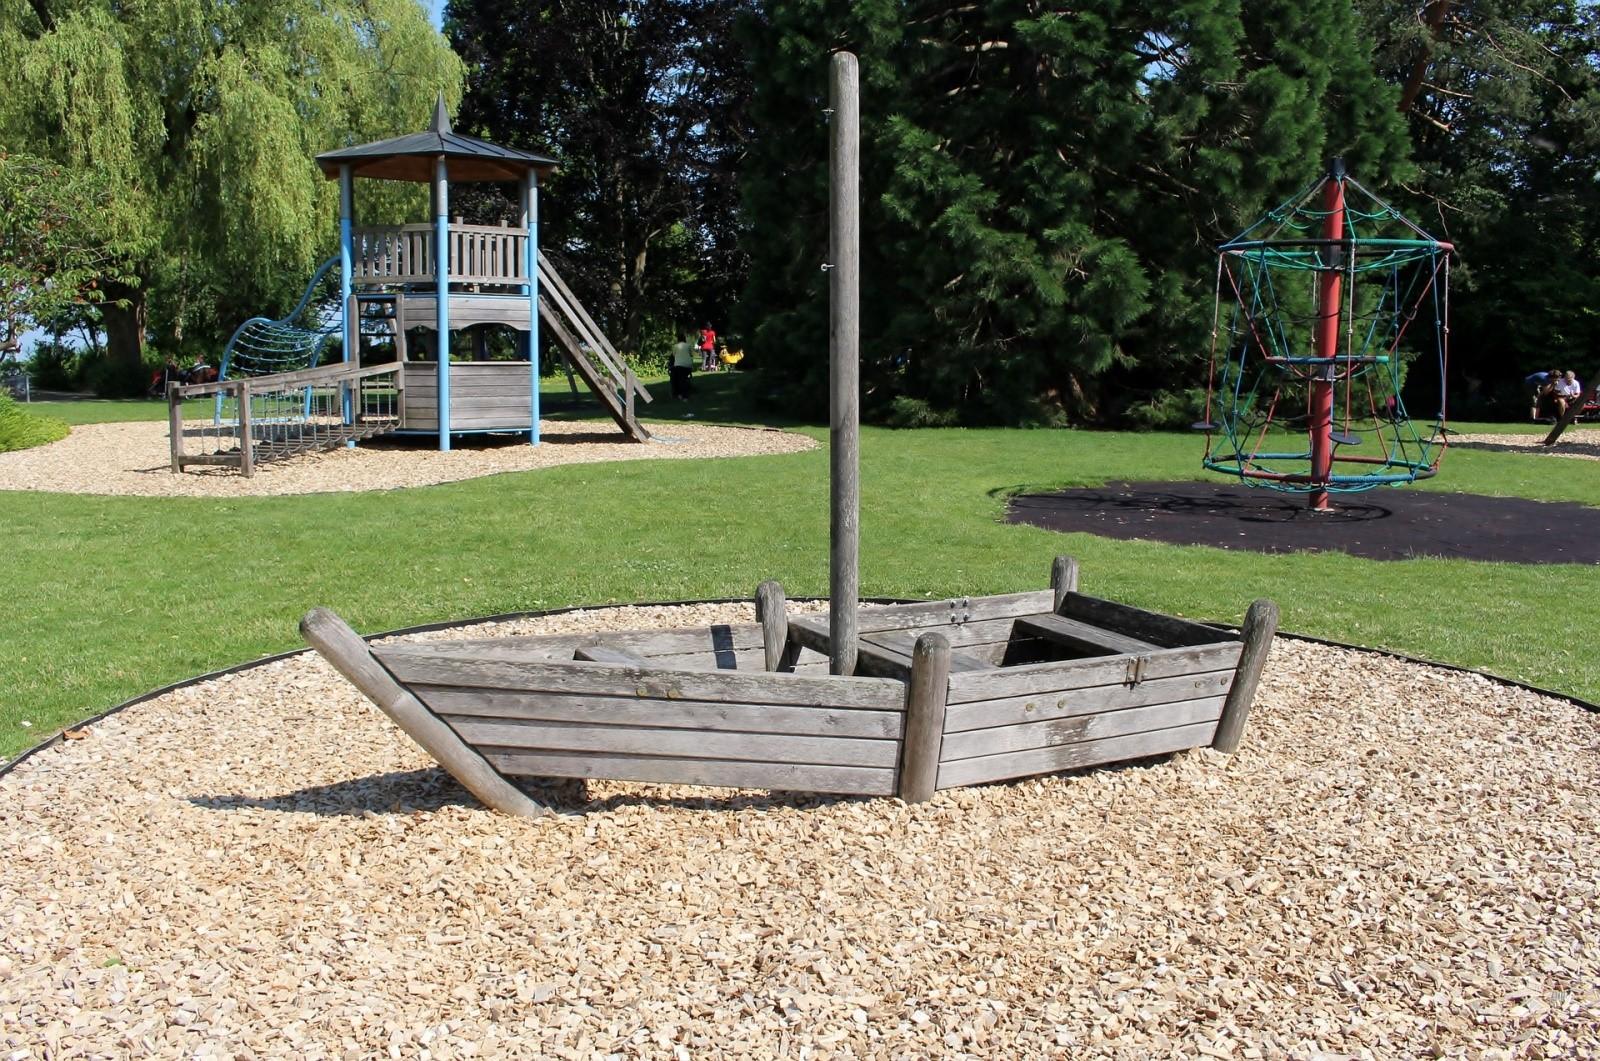 grama-sintetica-para-playground-parque-brincadeira